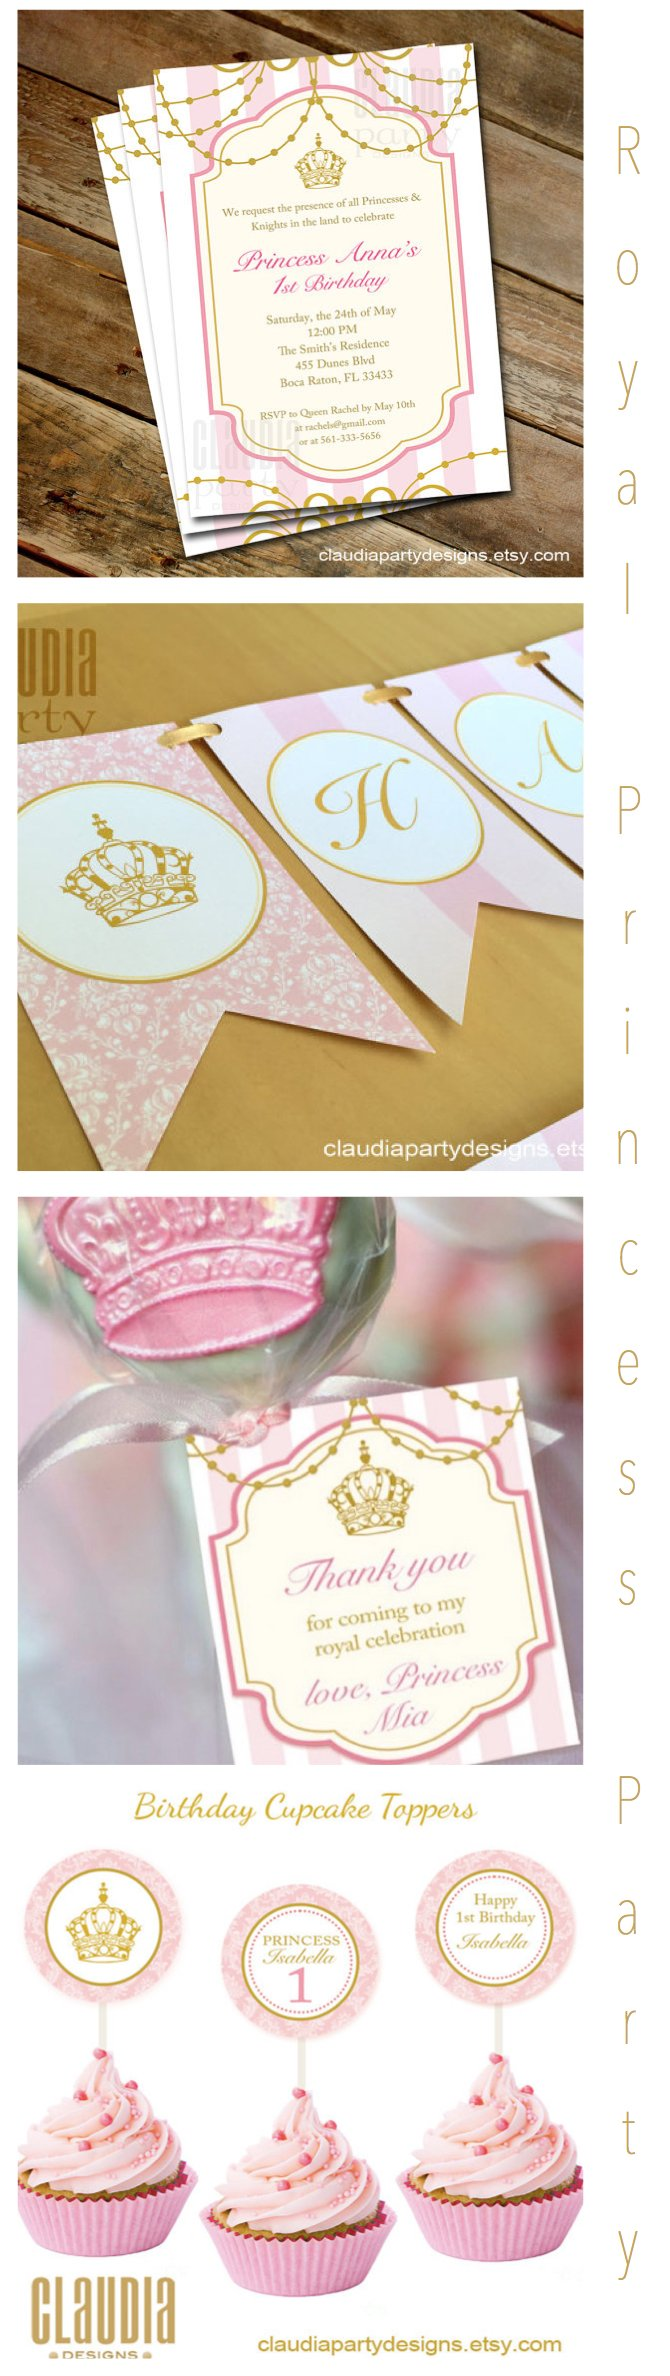 Royal Princess Party Printables